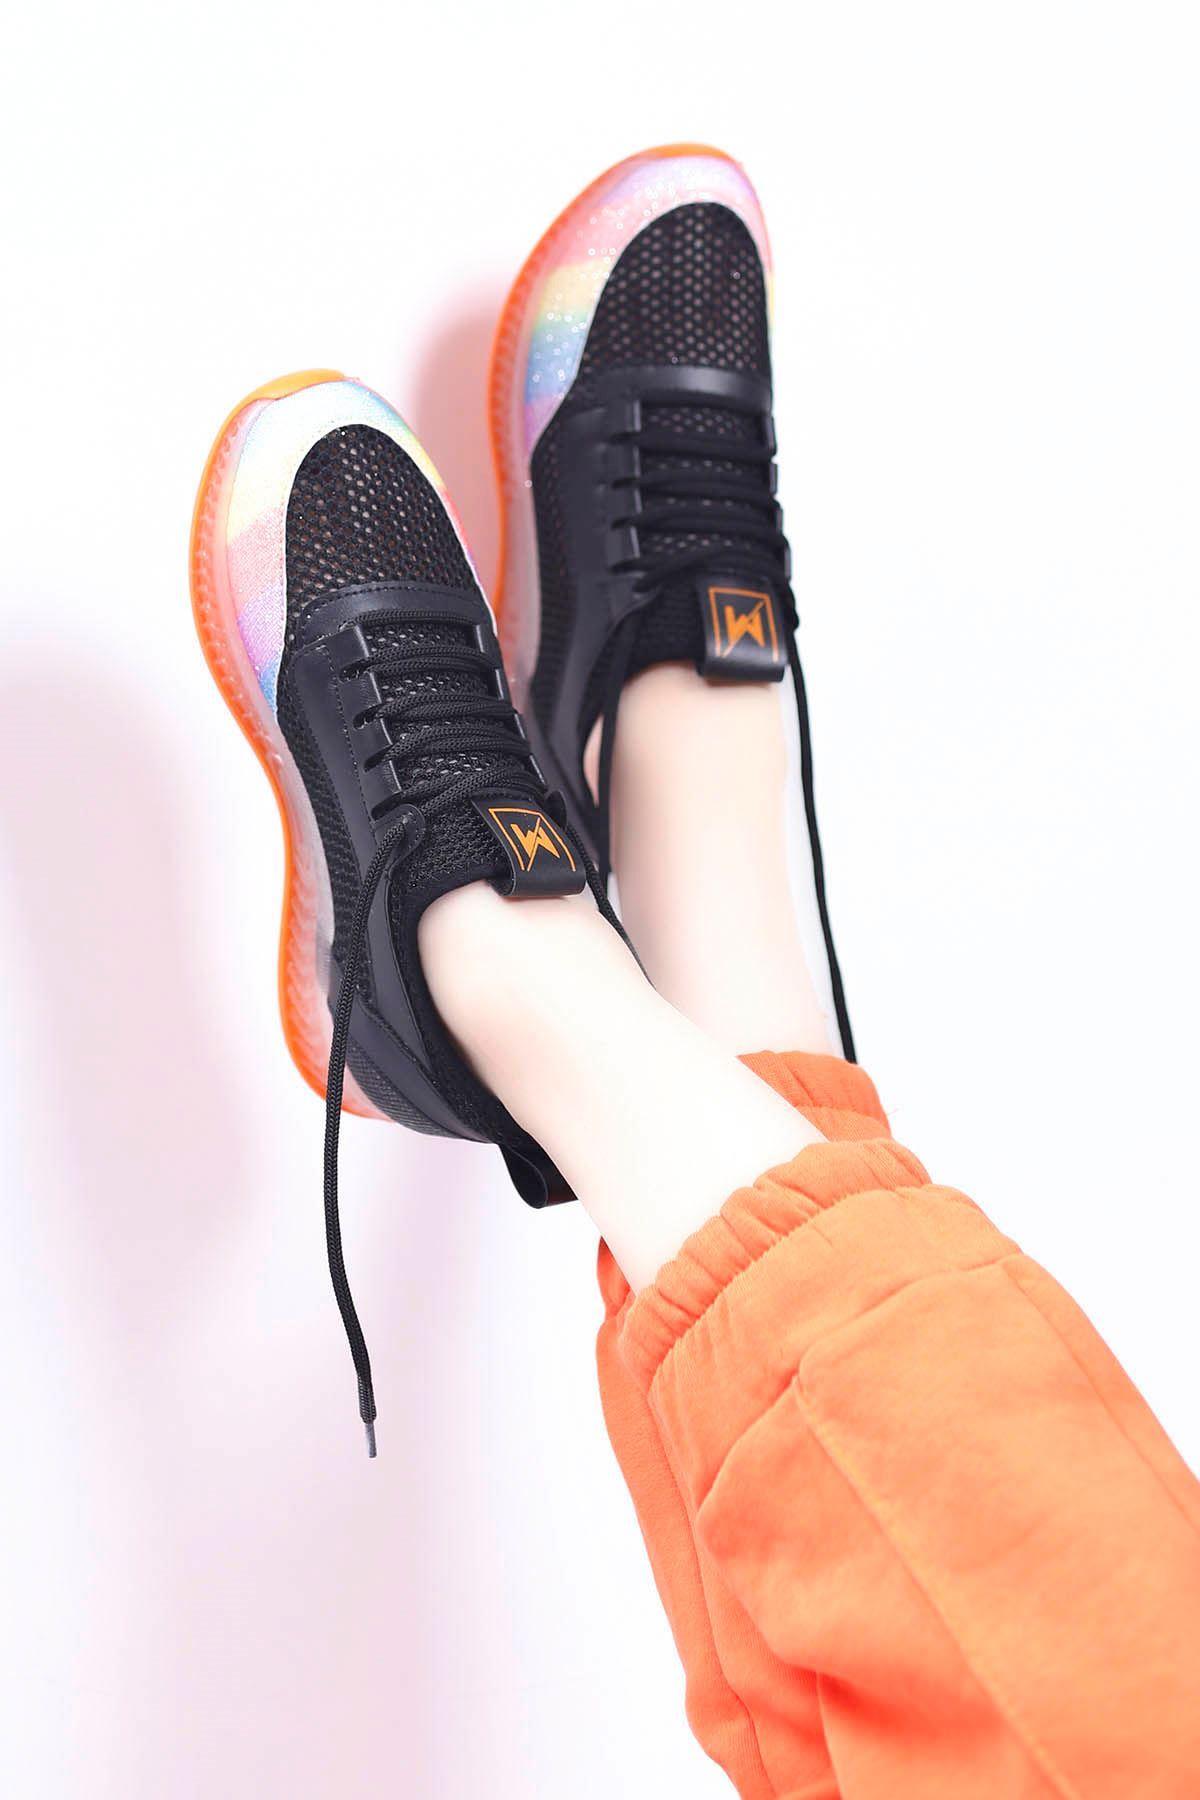 Sindirella Jel Taban Triko Spor Ayakkabı Siyah Tutuncu Taban